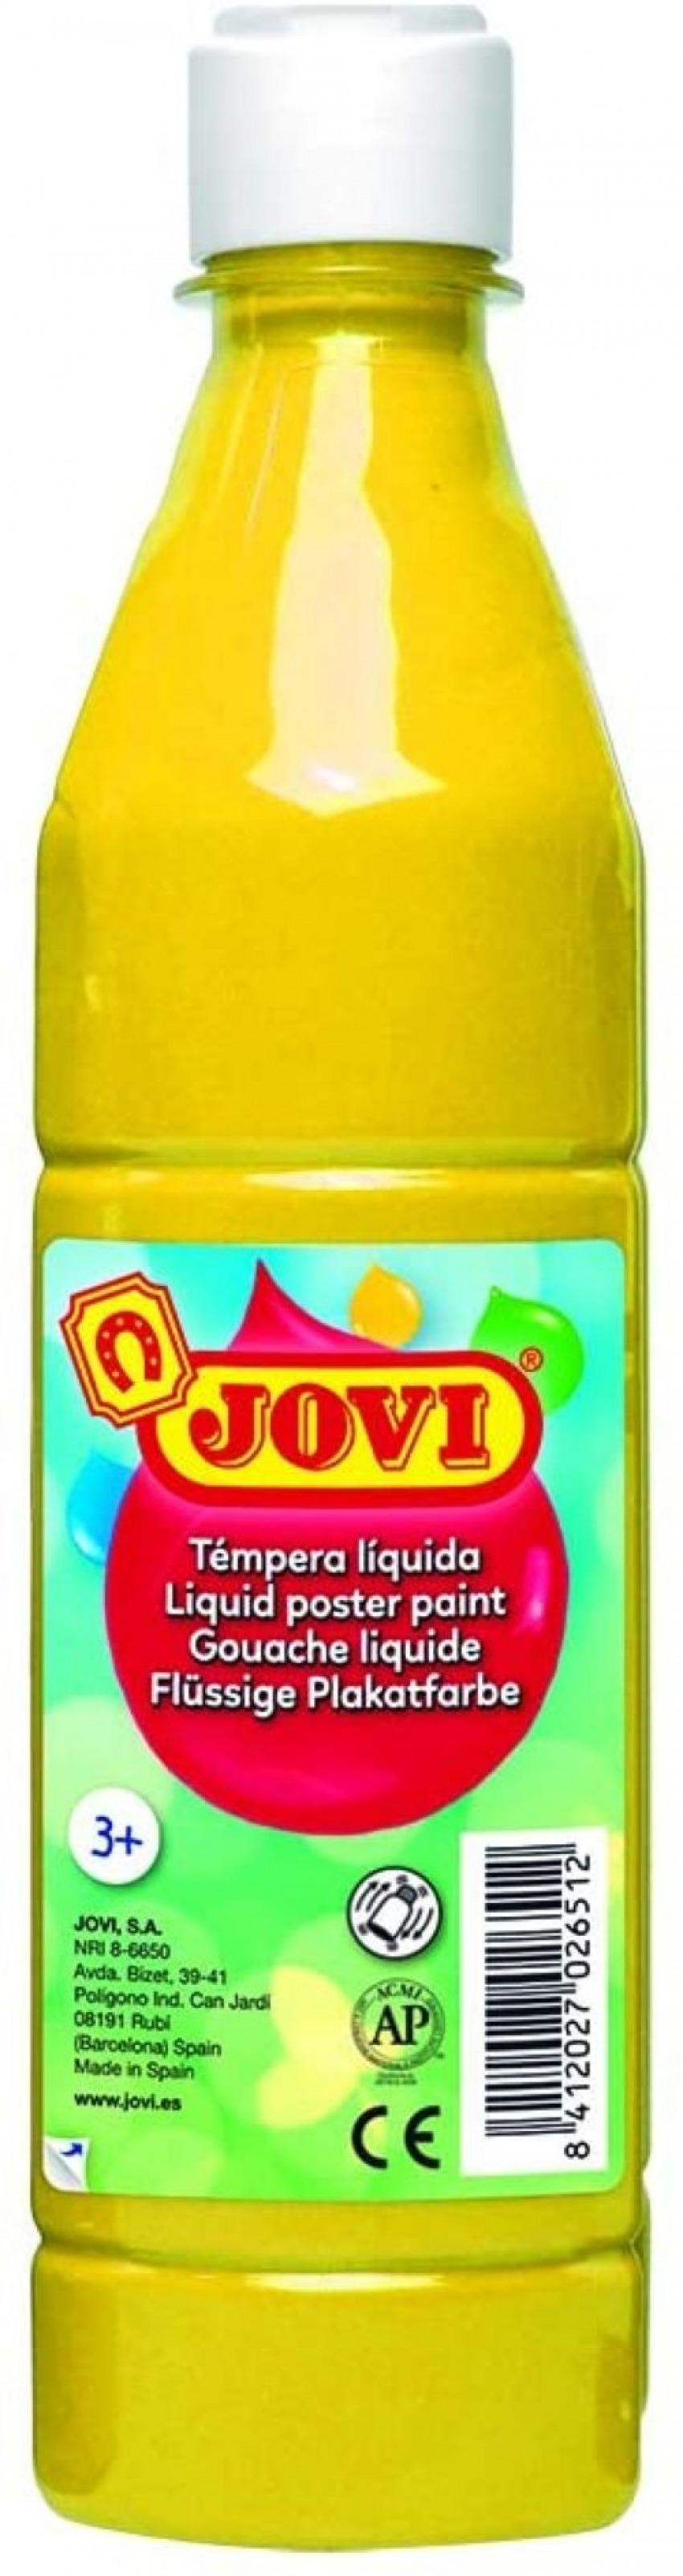 Bote tempera liquida jovi amarillo 500 ml 8412027003650